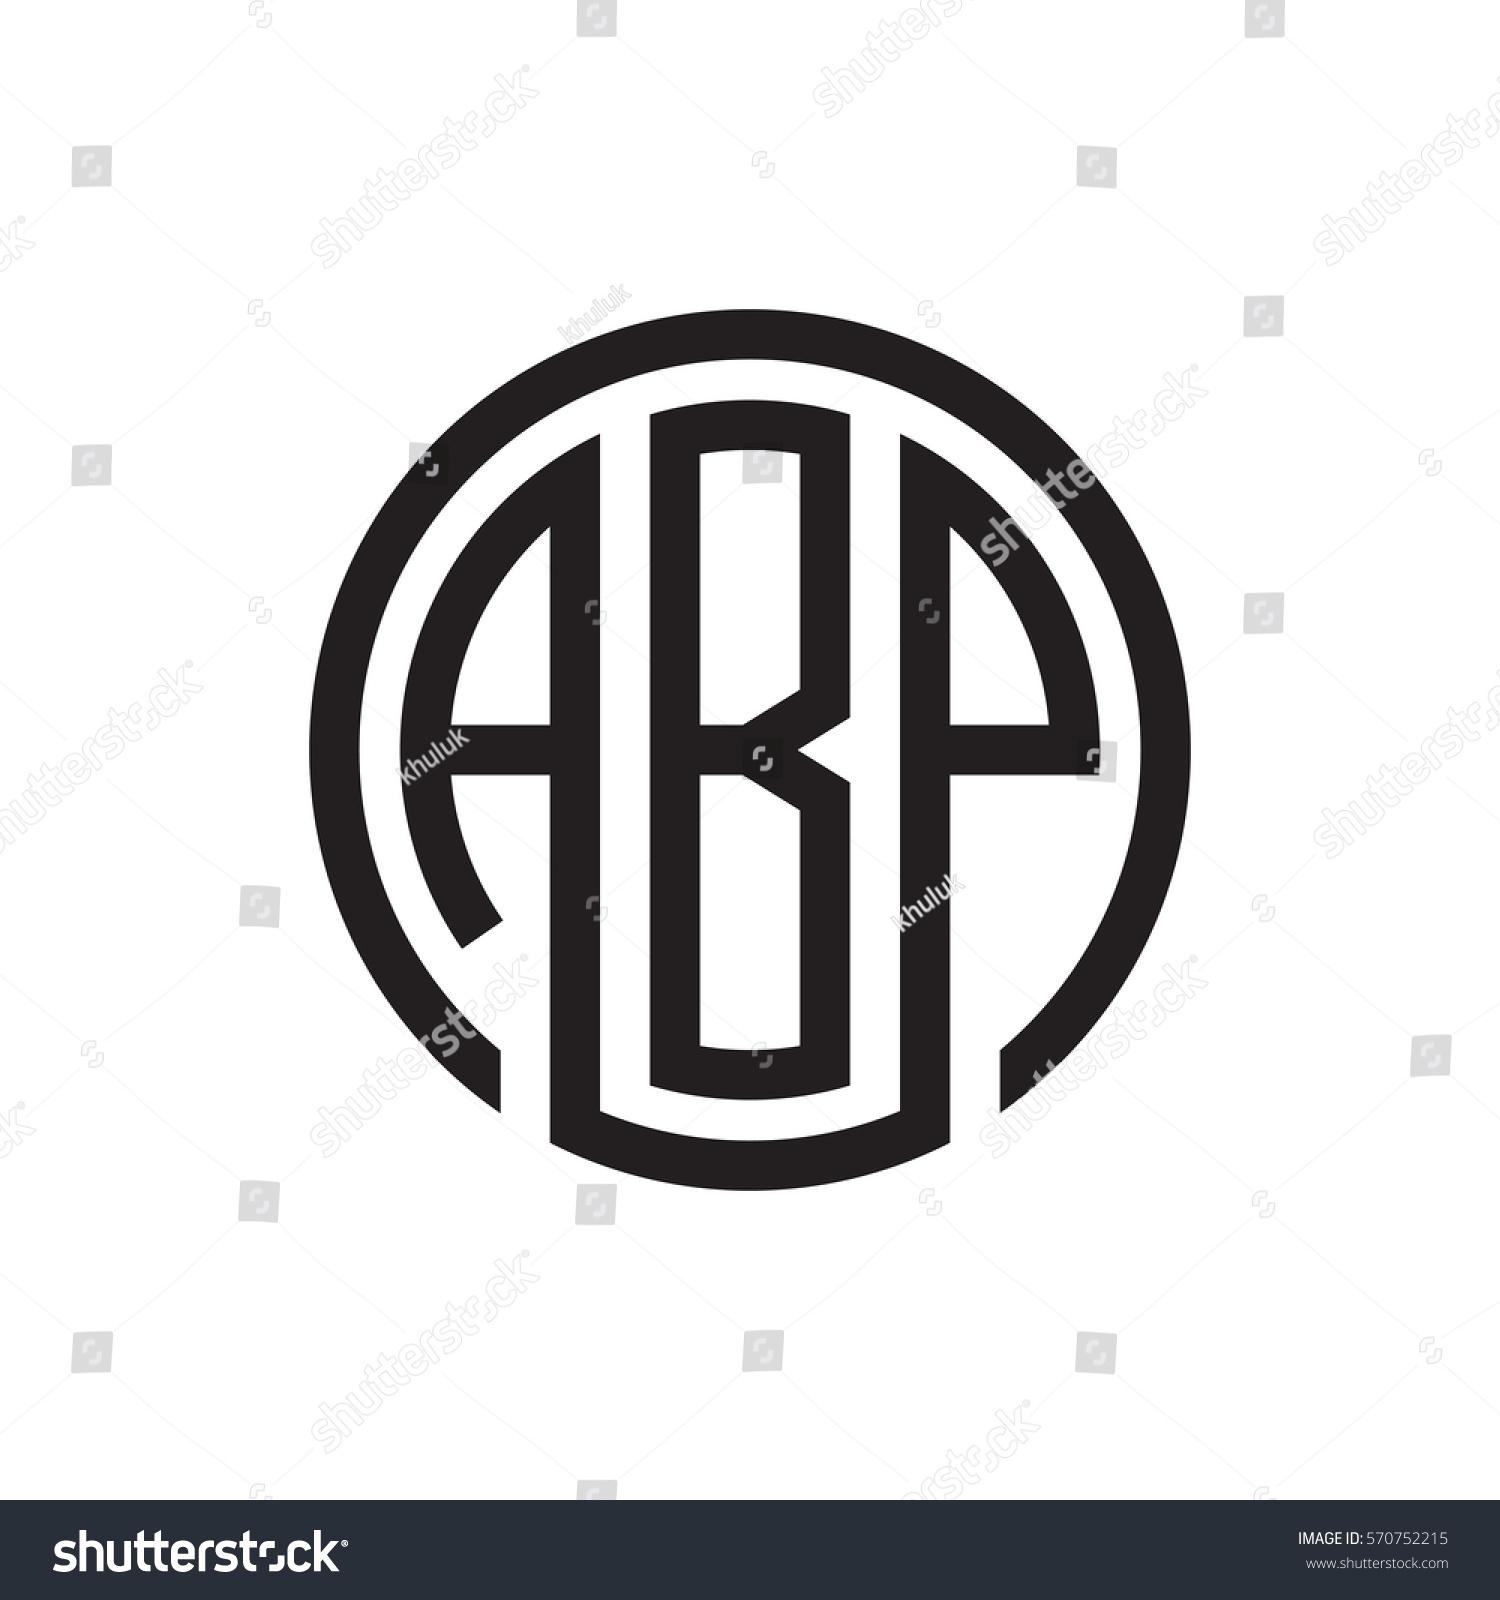 Initial Three Letter Logo Circle Black Stock Vector